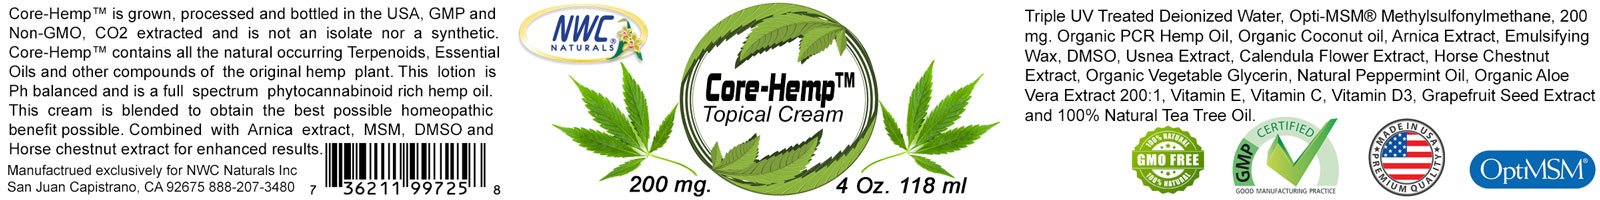 Core-Hemp-Label